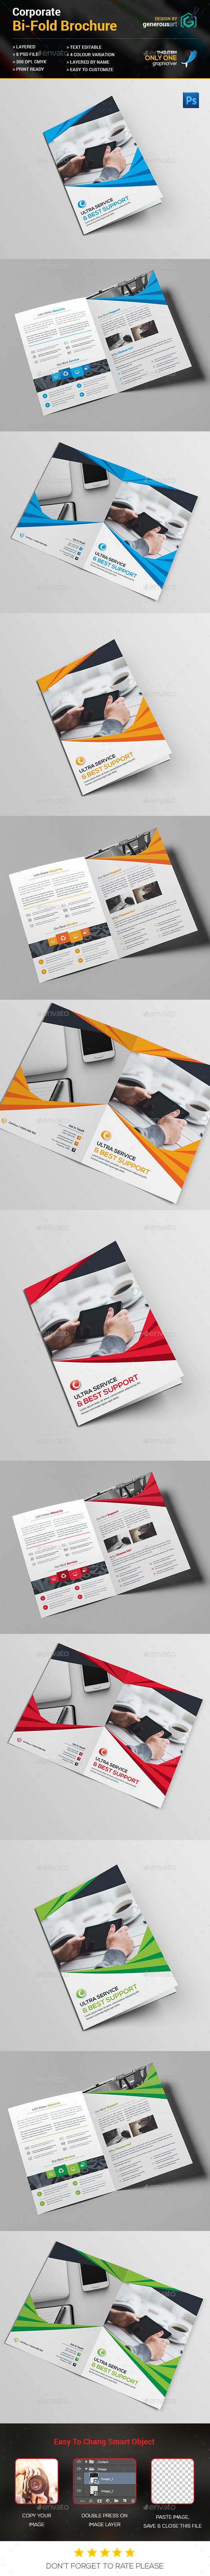 Bi-Fold Business Brochure - Corporate Brochures